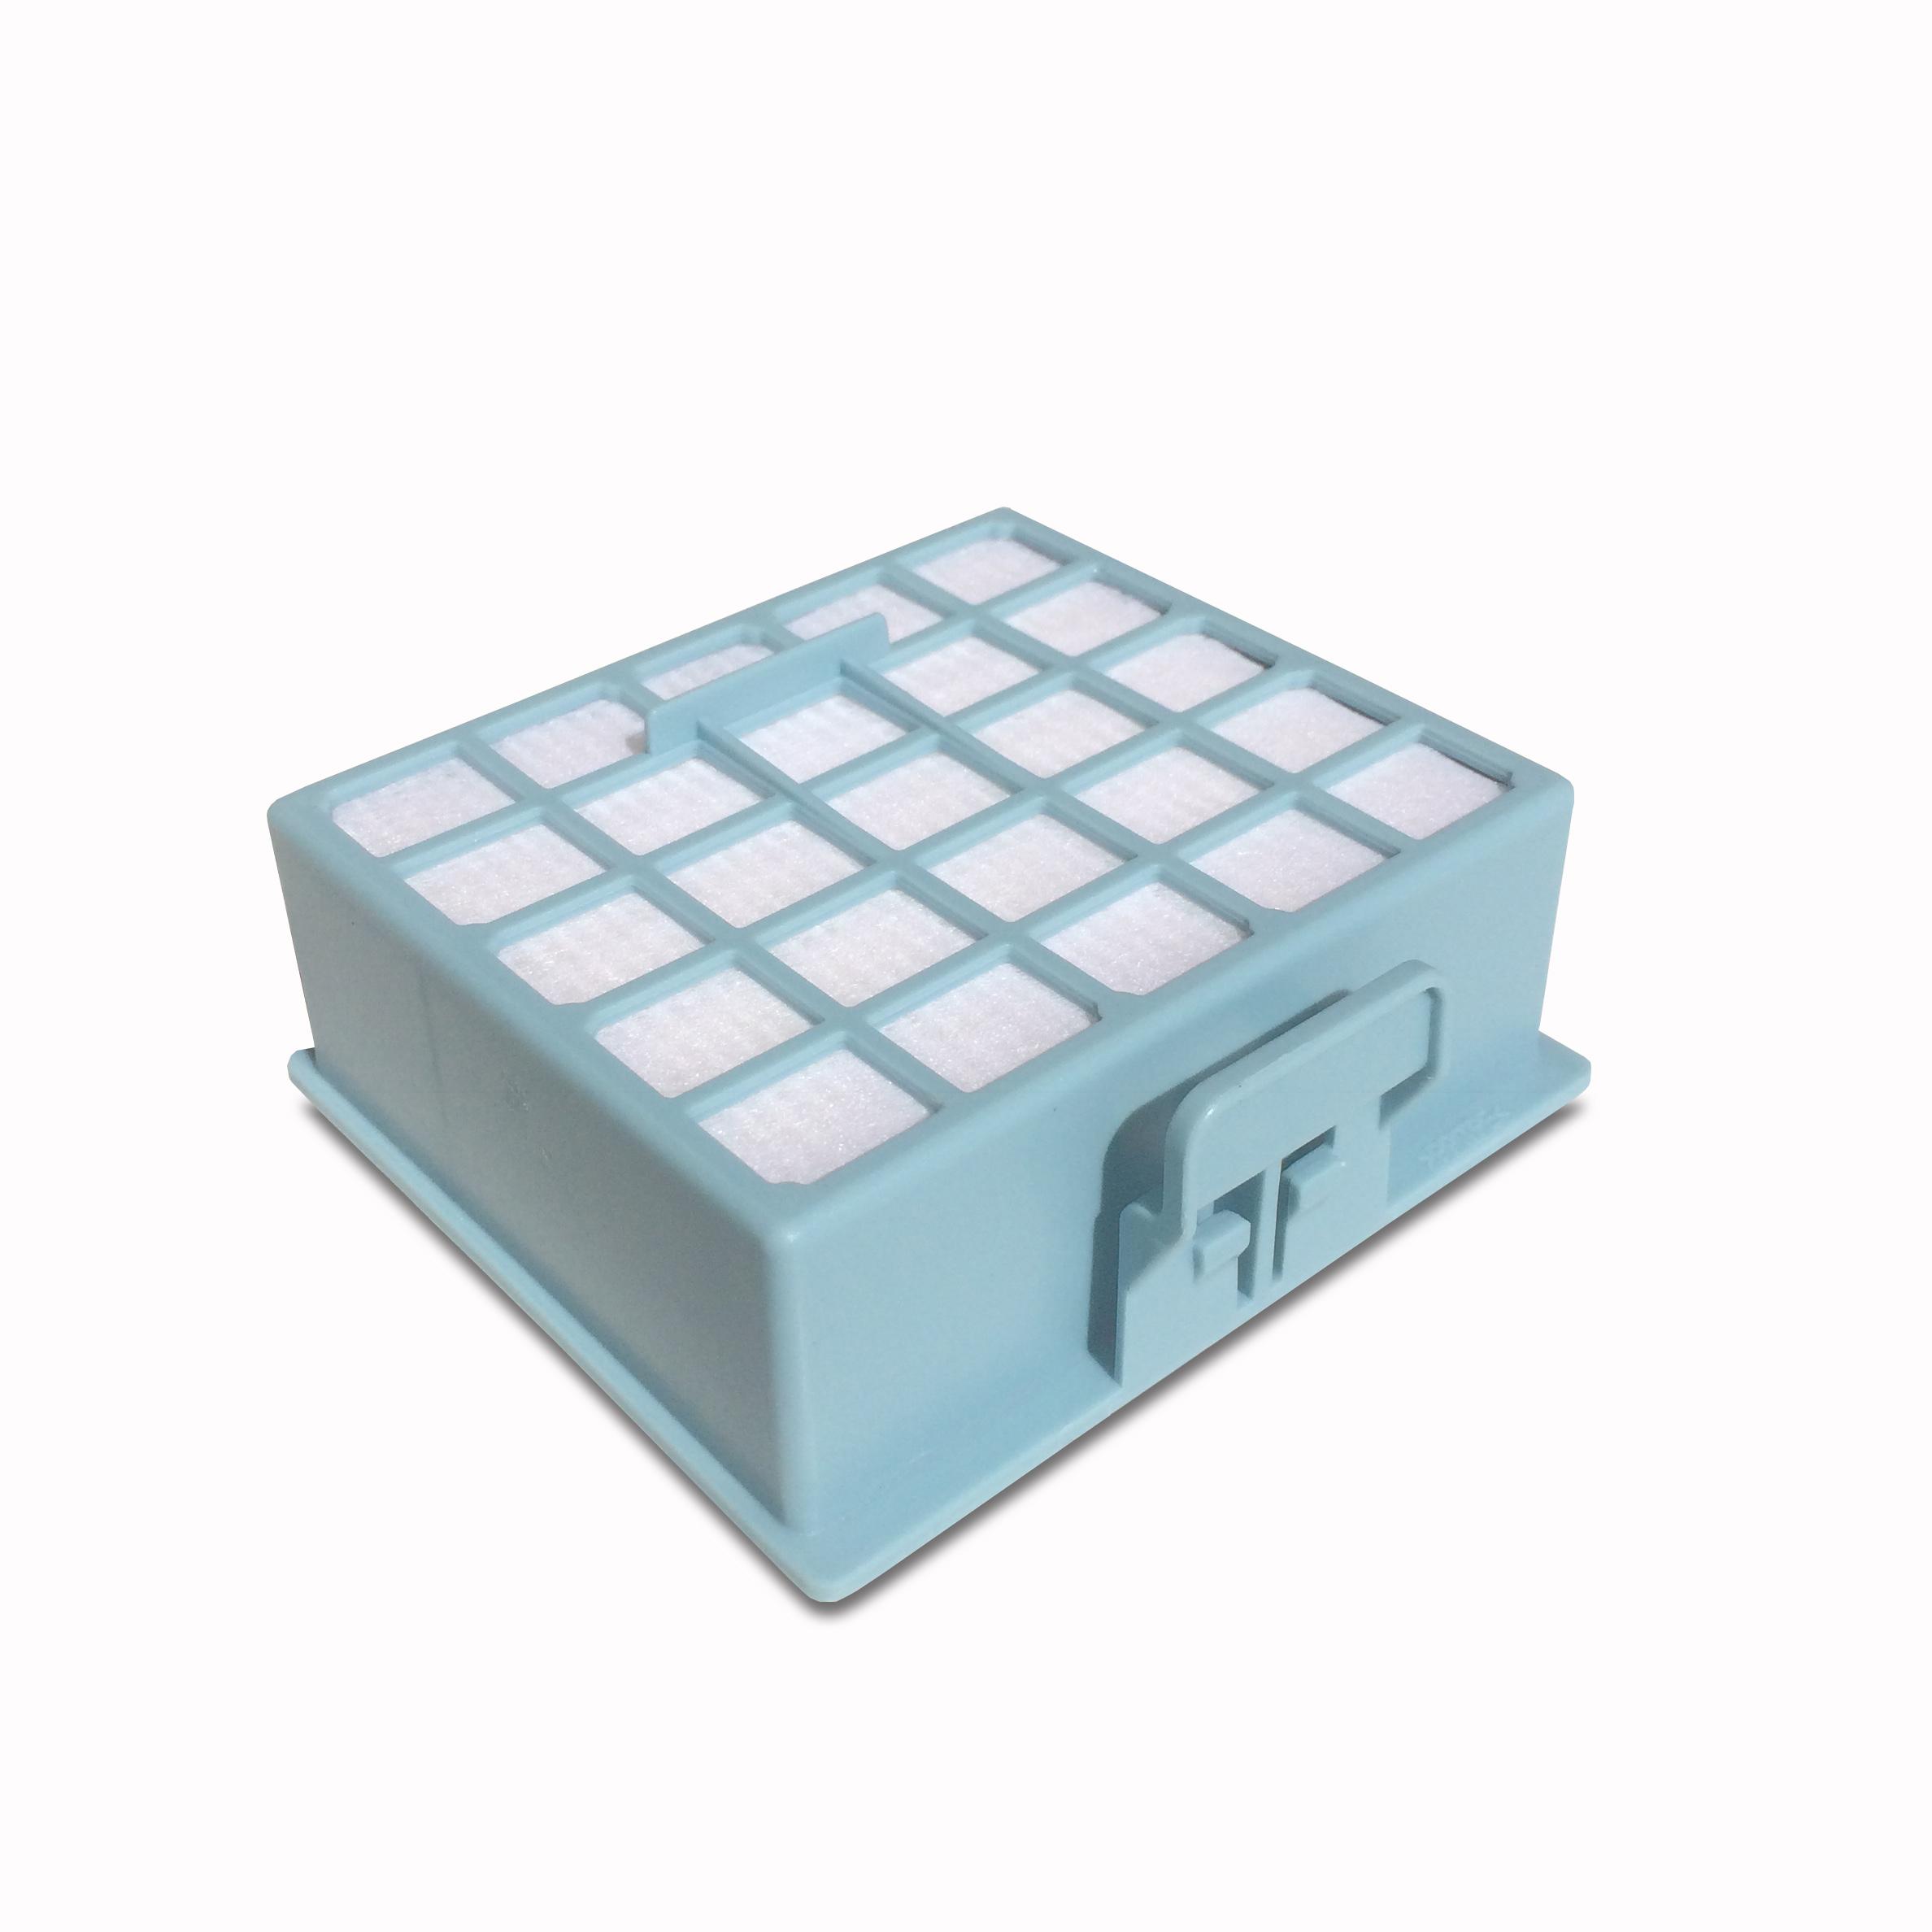 Hepa Filter geeignet für Siemens VS 06 G 183002, VS 06 G